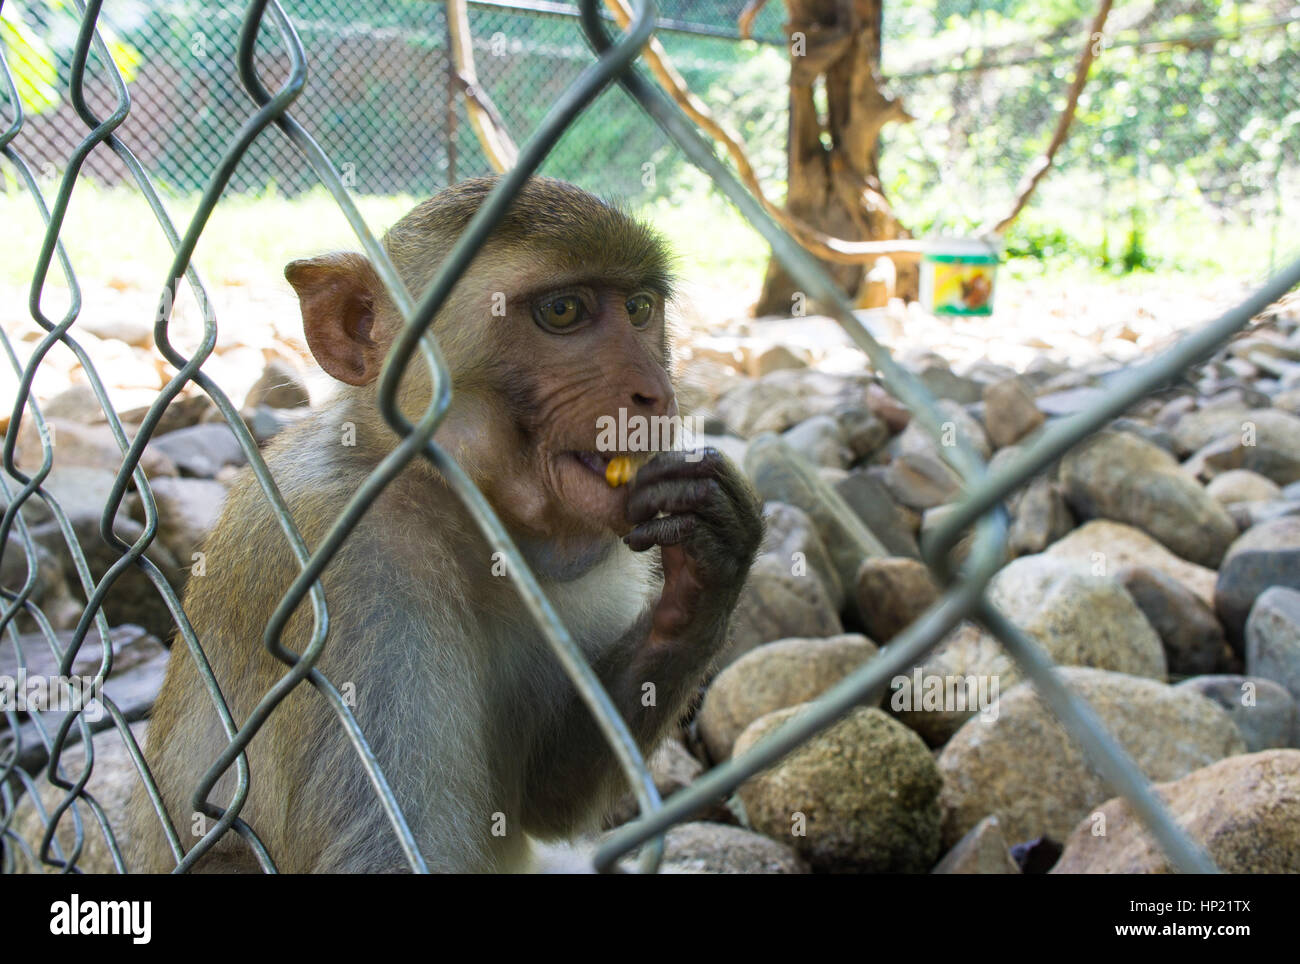 Monkey in the zoo